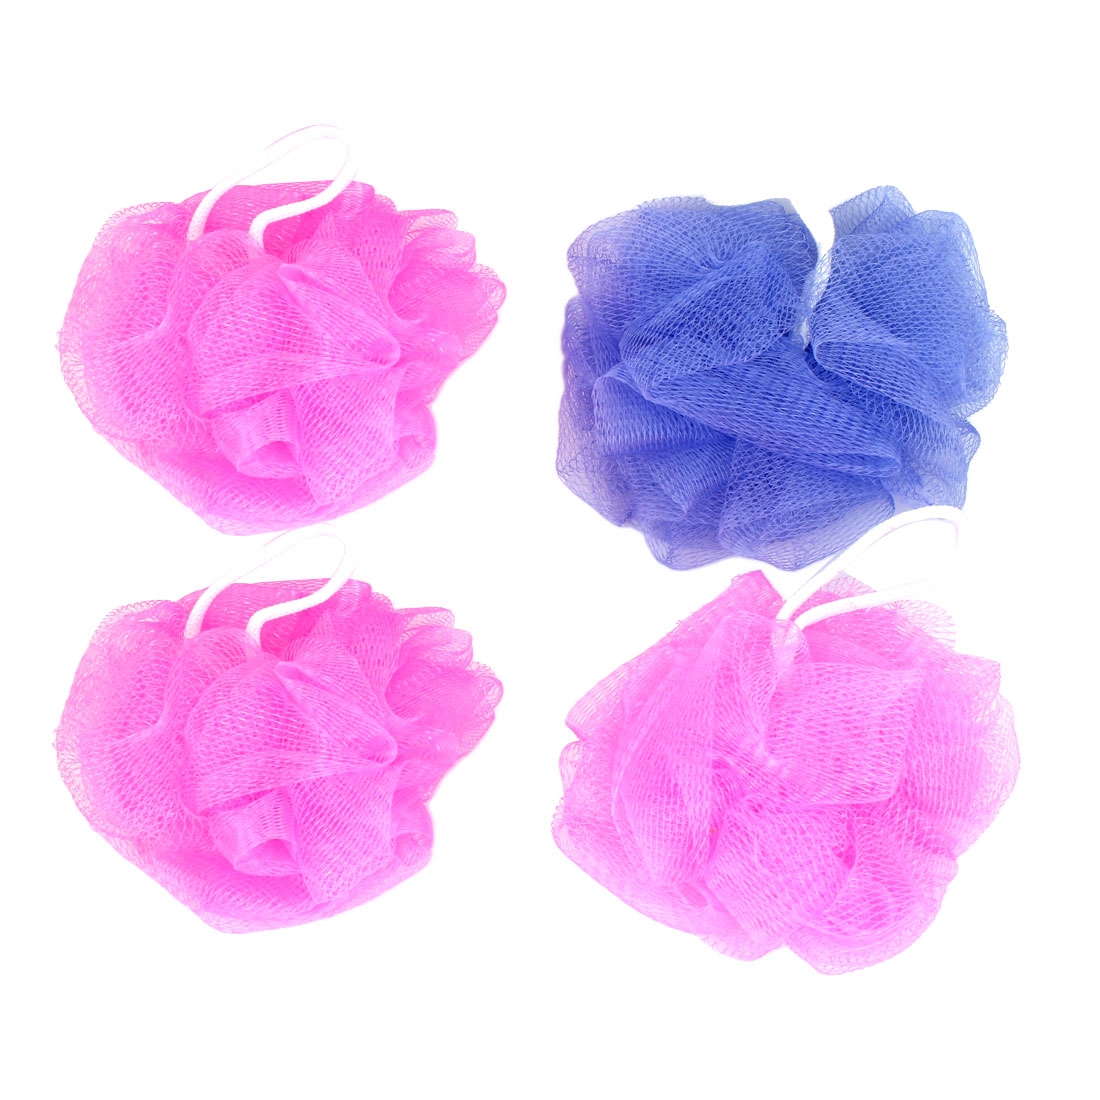 Bathroom Pink Blue Nylon Body Washing Shower Ball Mesh Nets Pouf 4 Pcs